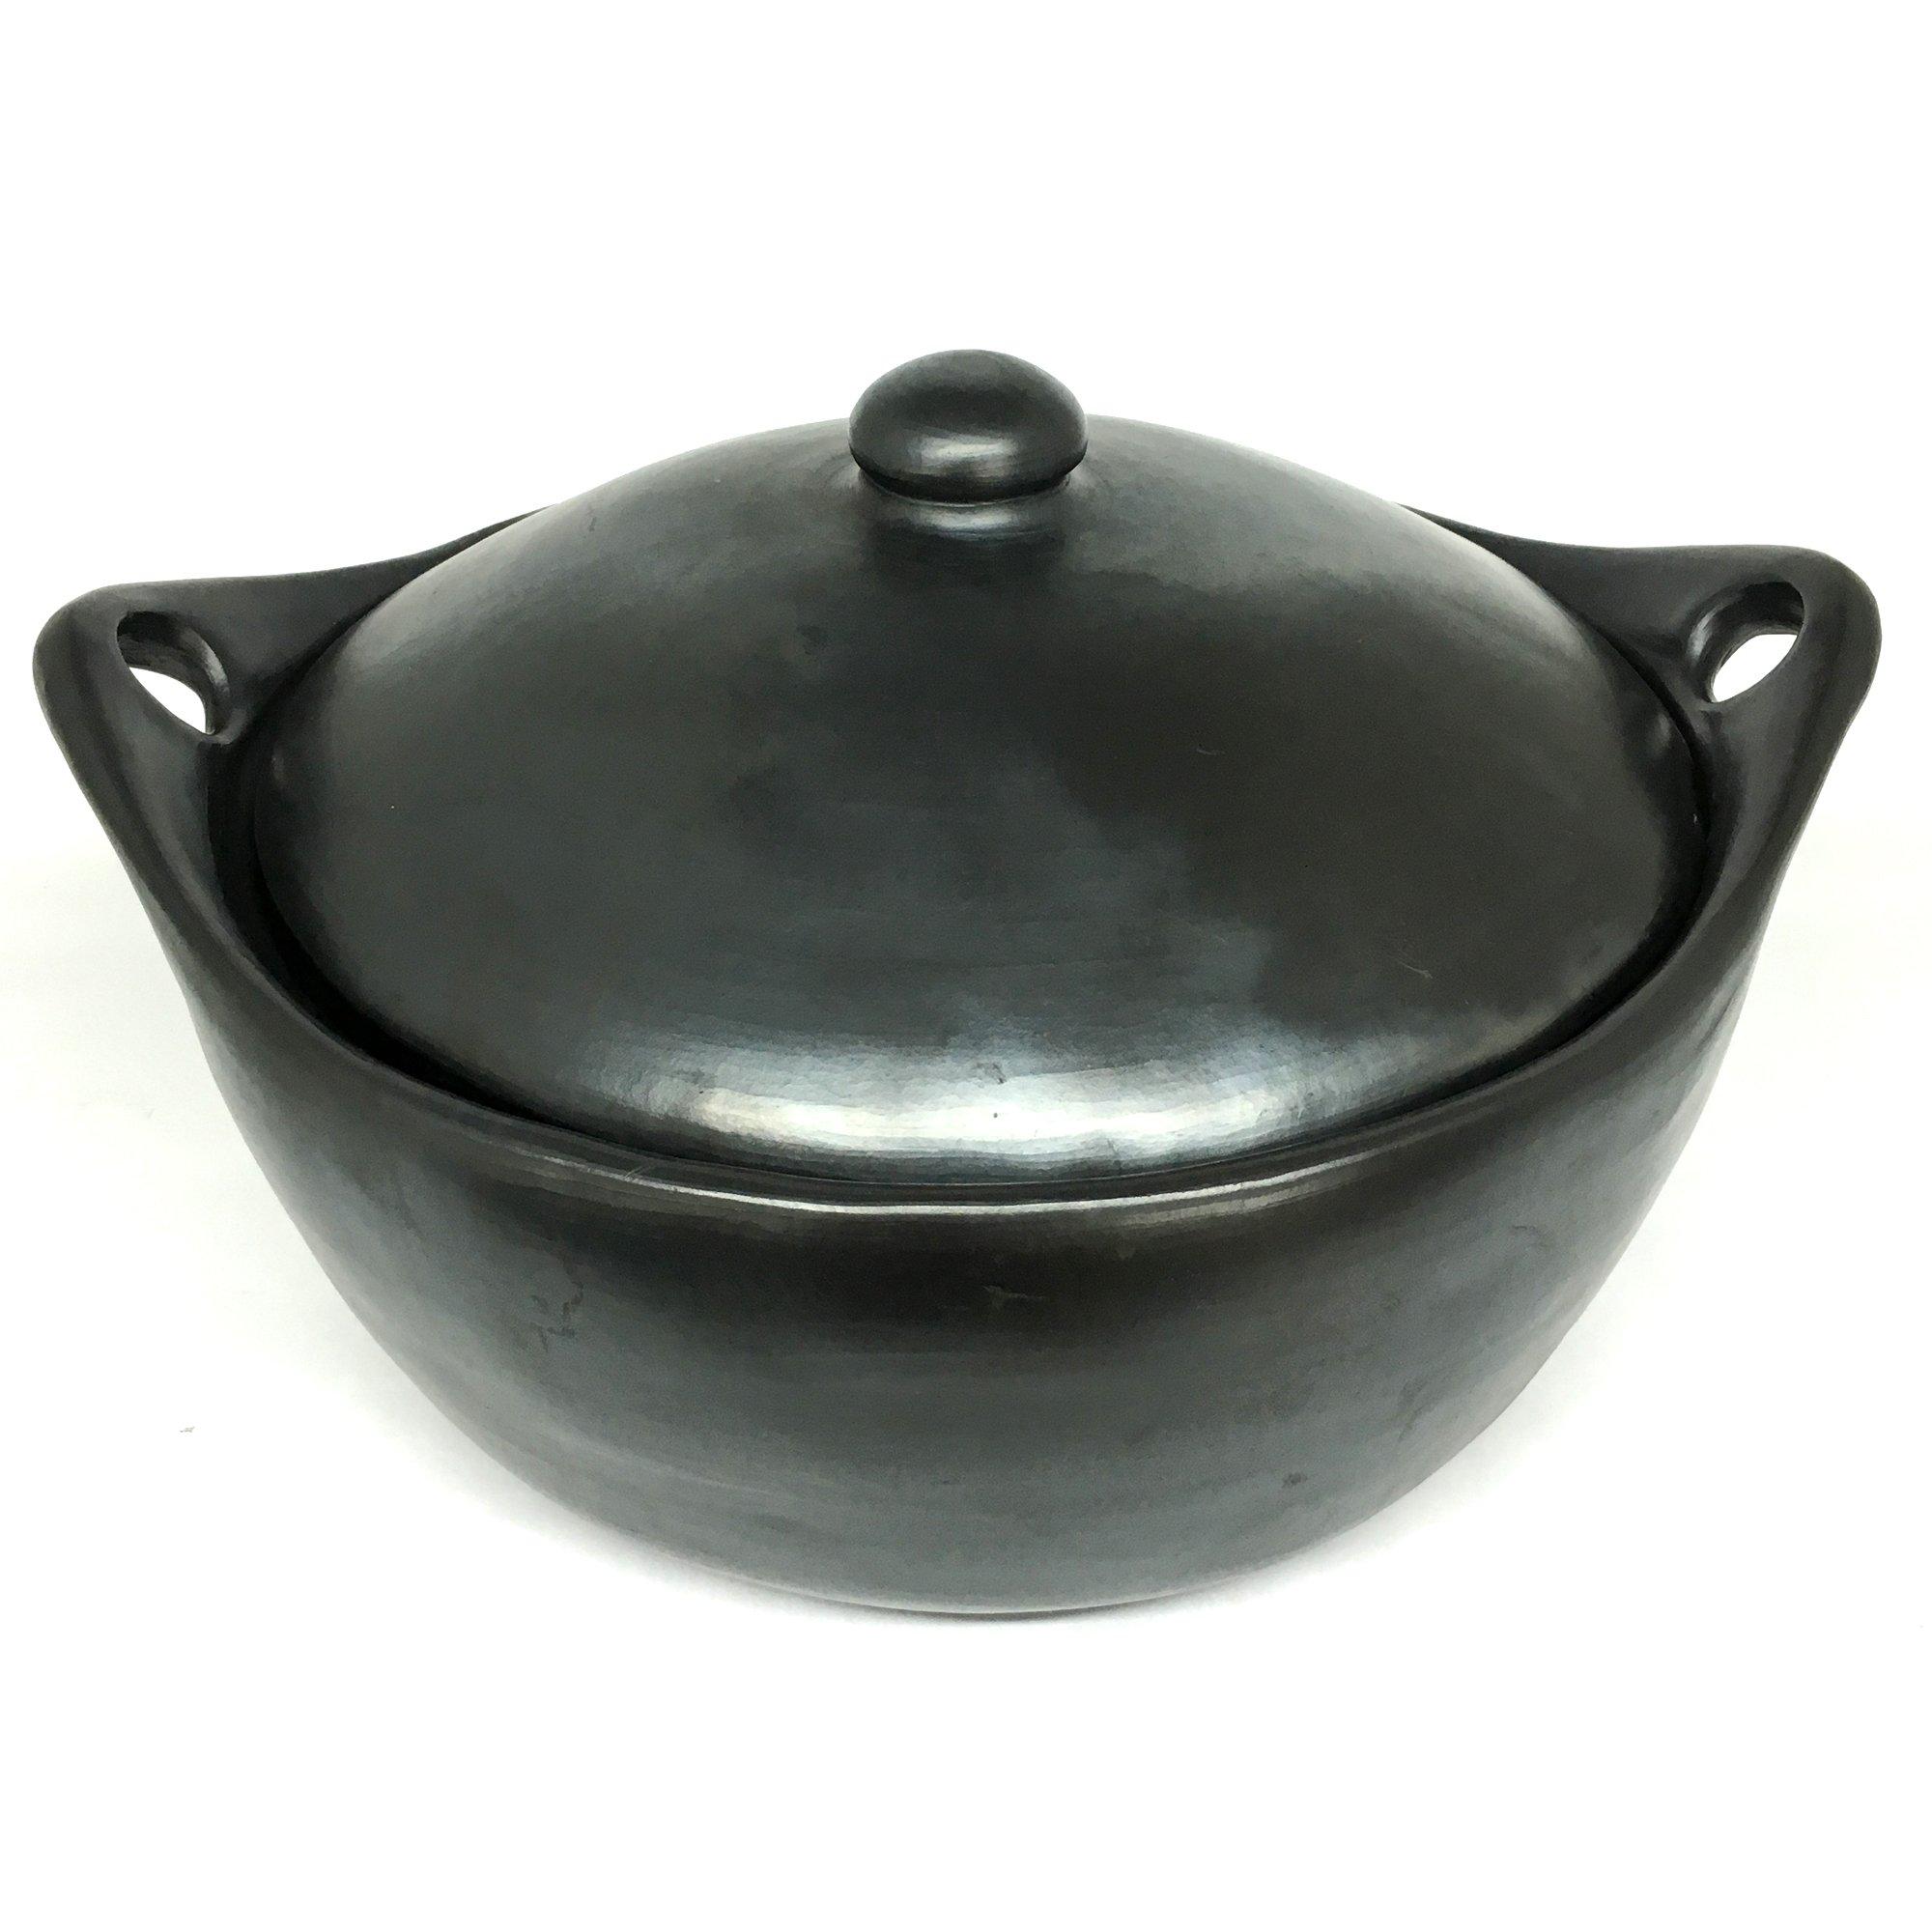 Black Clay, La Chamba Stew Pot - Colossal - 13.5 Quarts